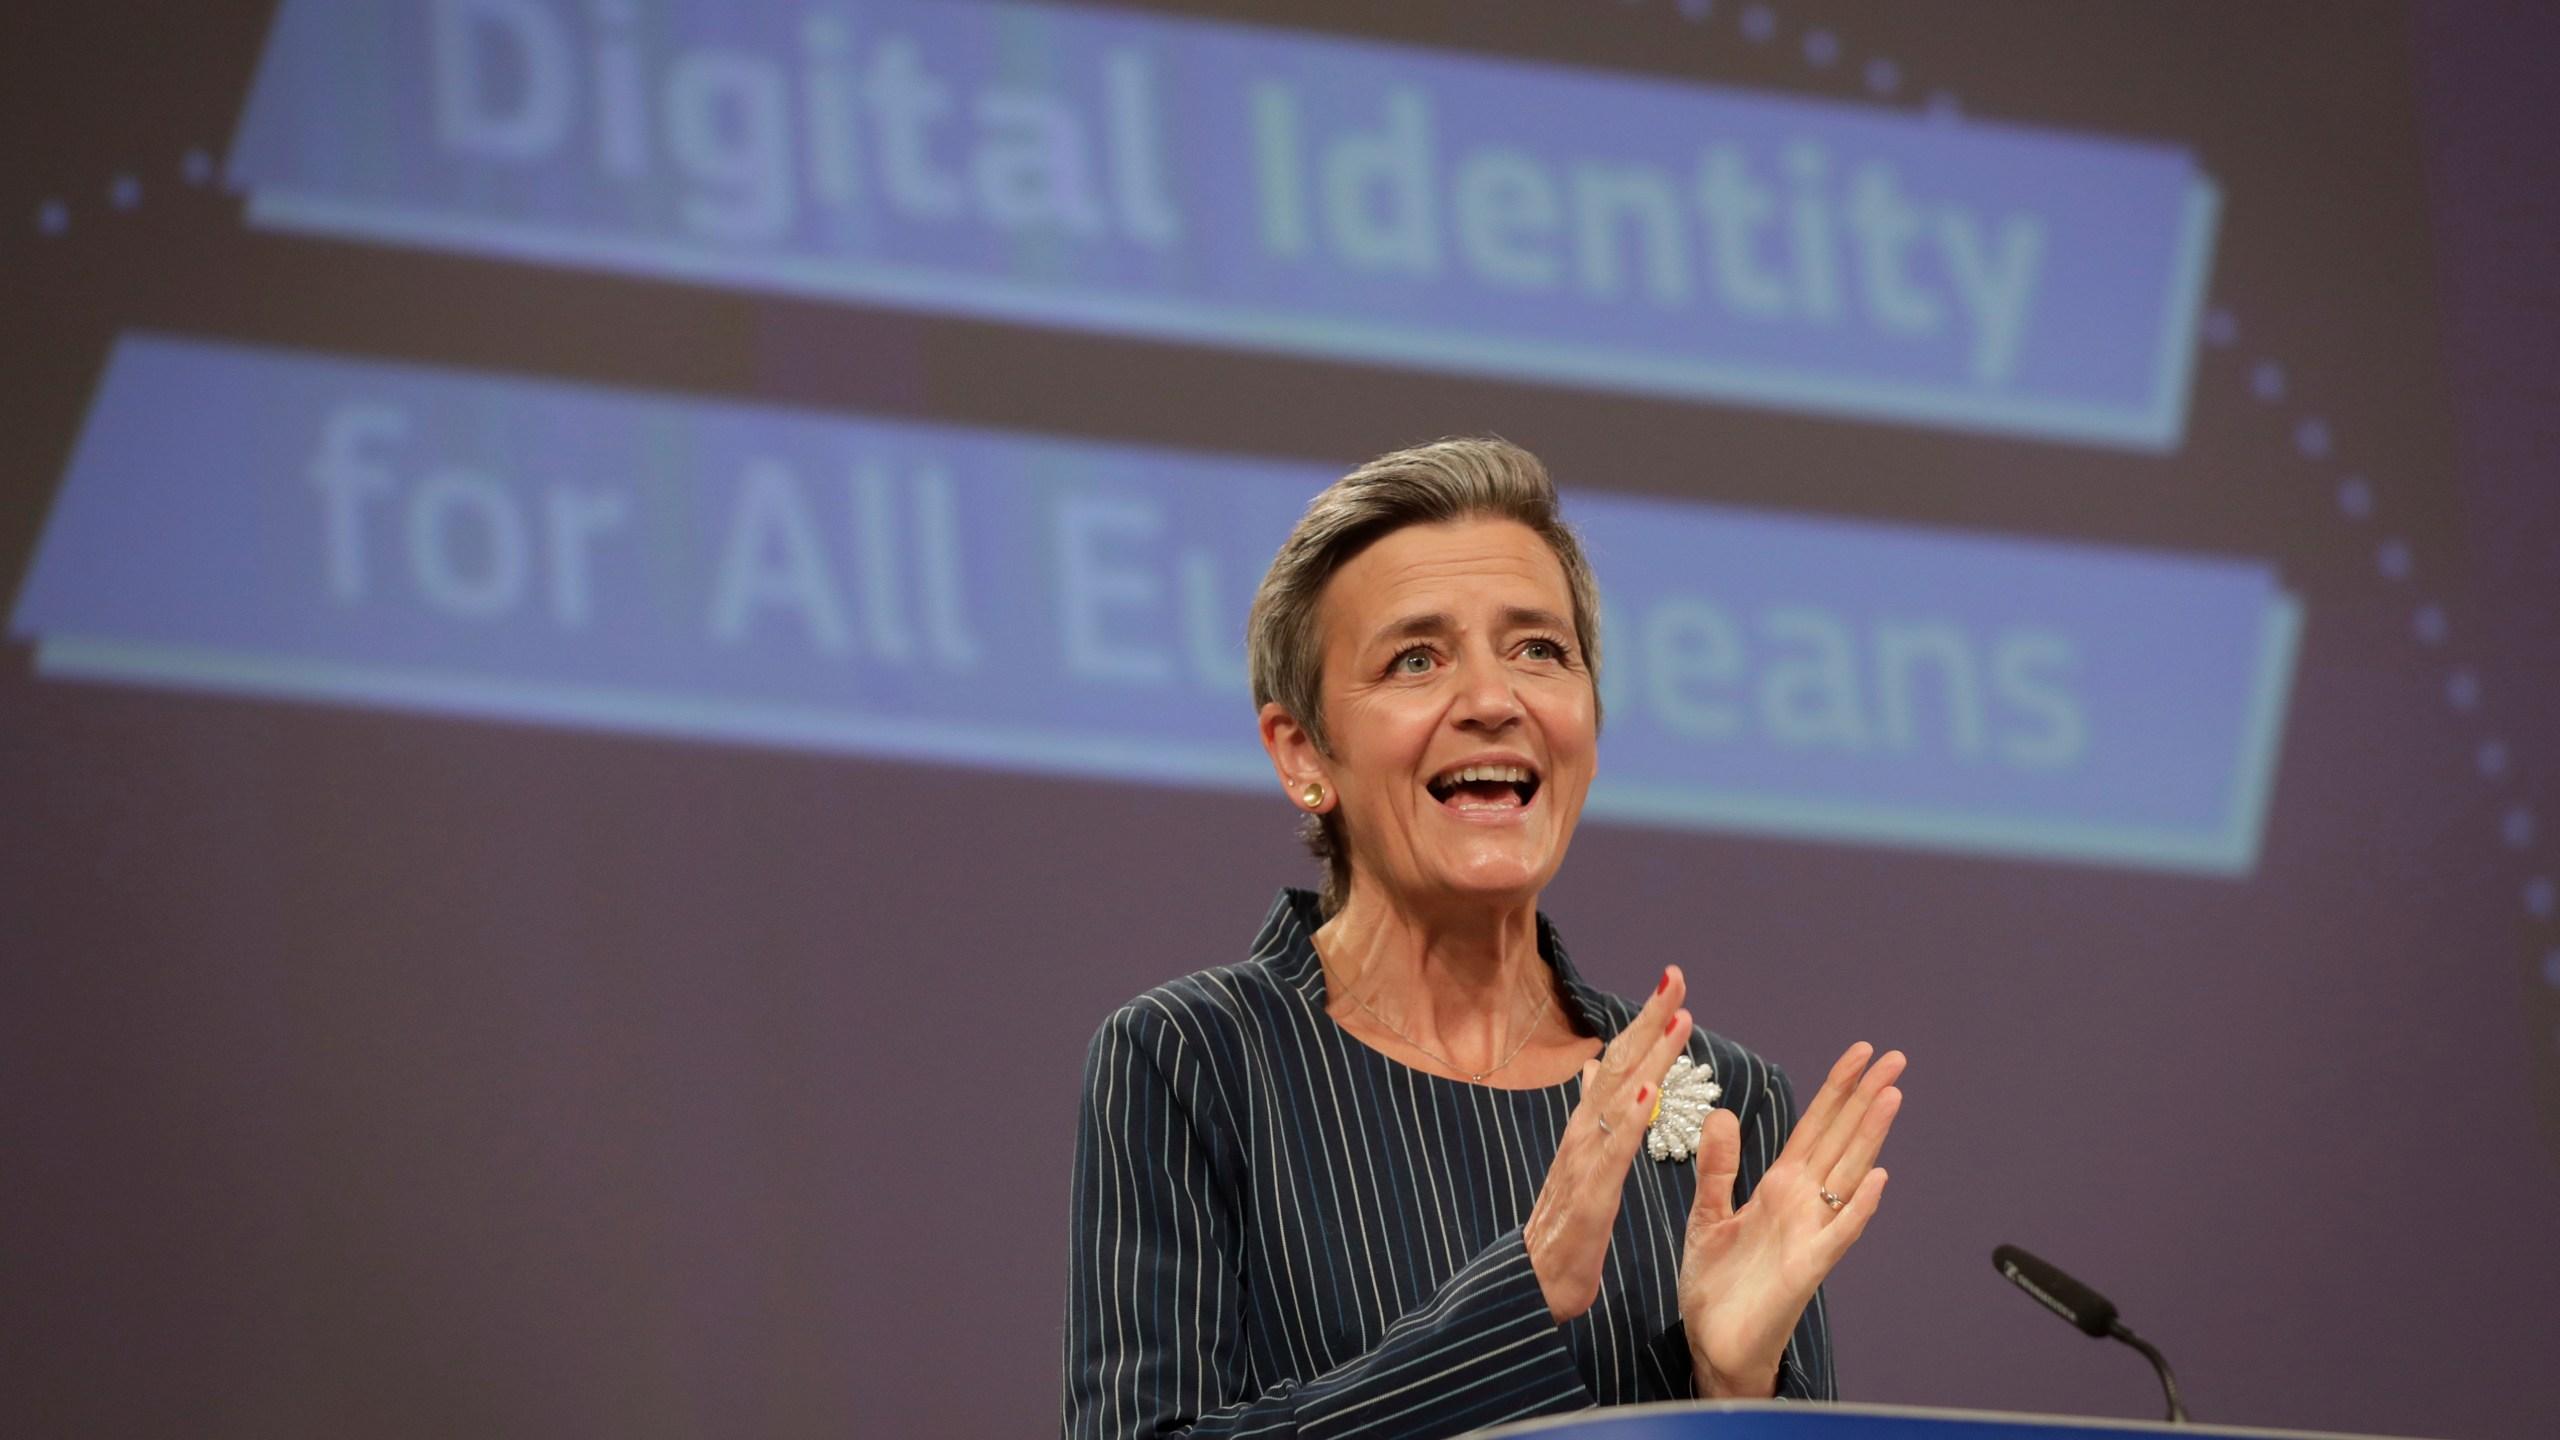 Press conference on establishing a European Digital Identity Framework